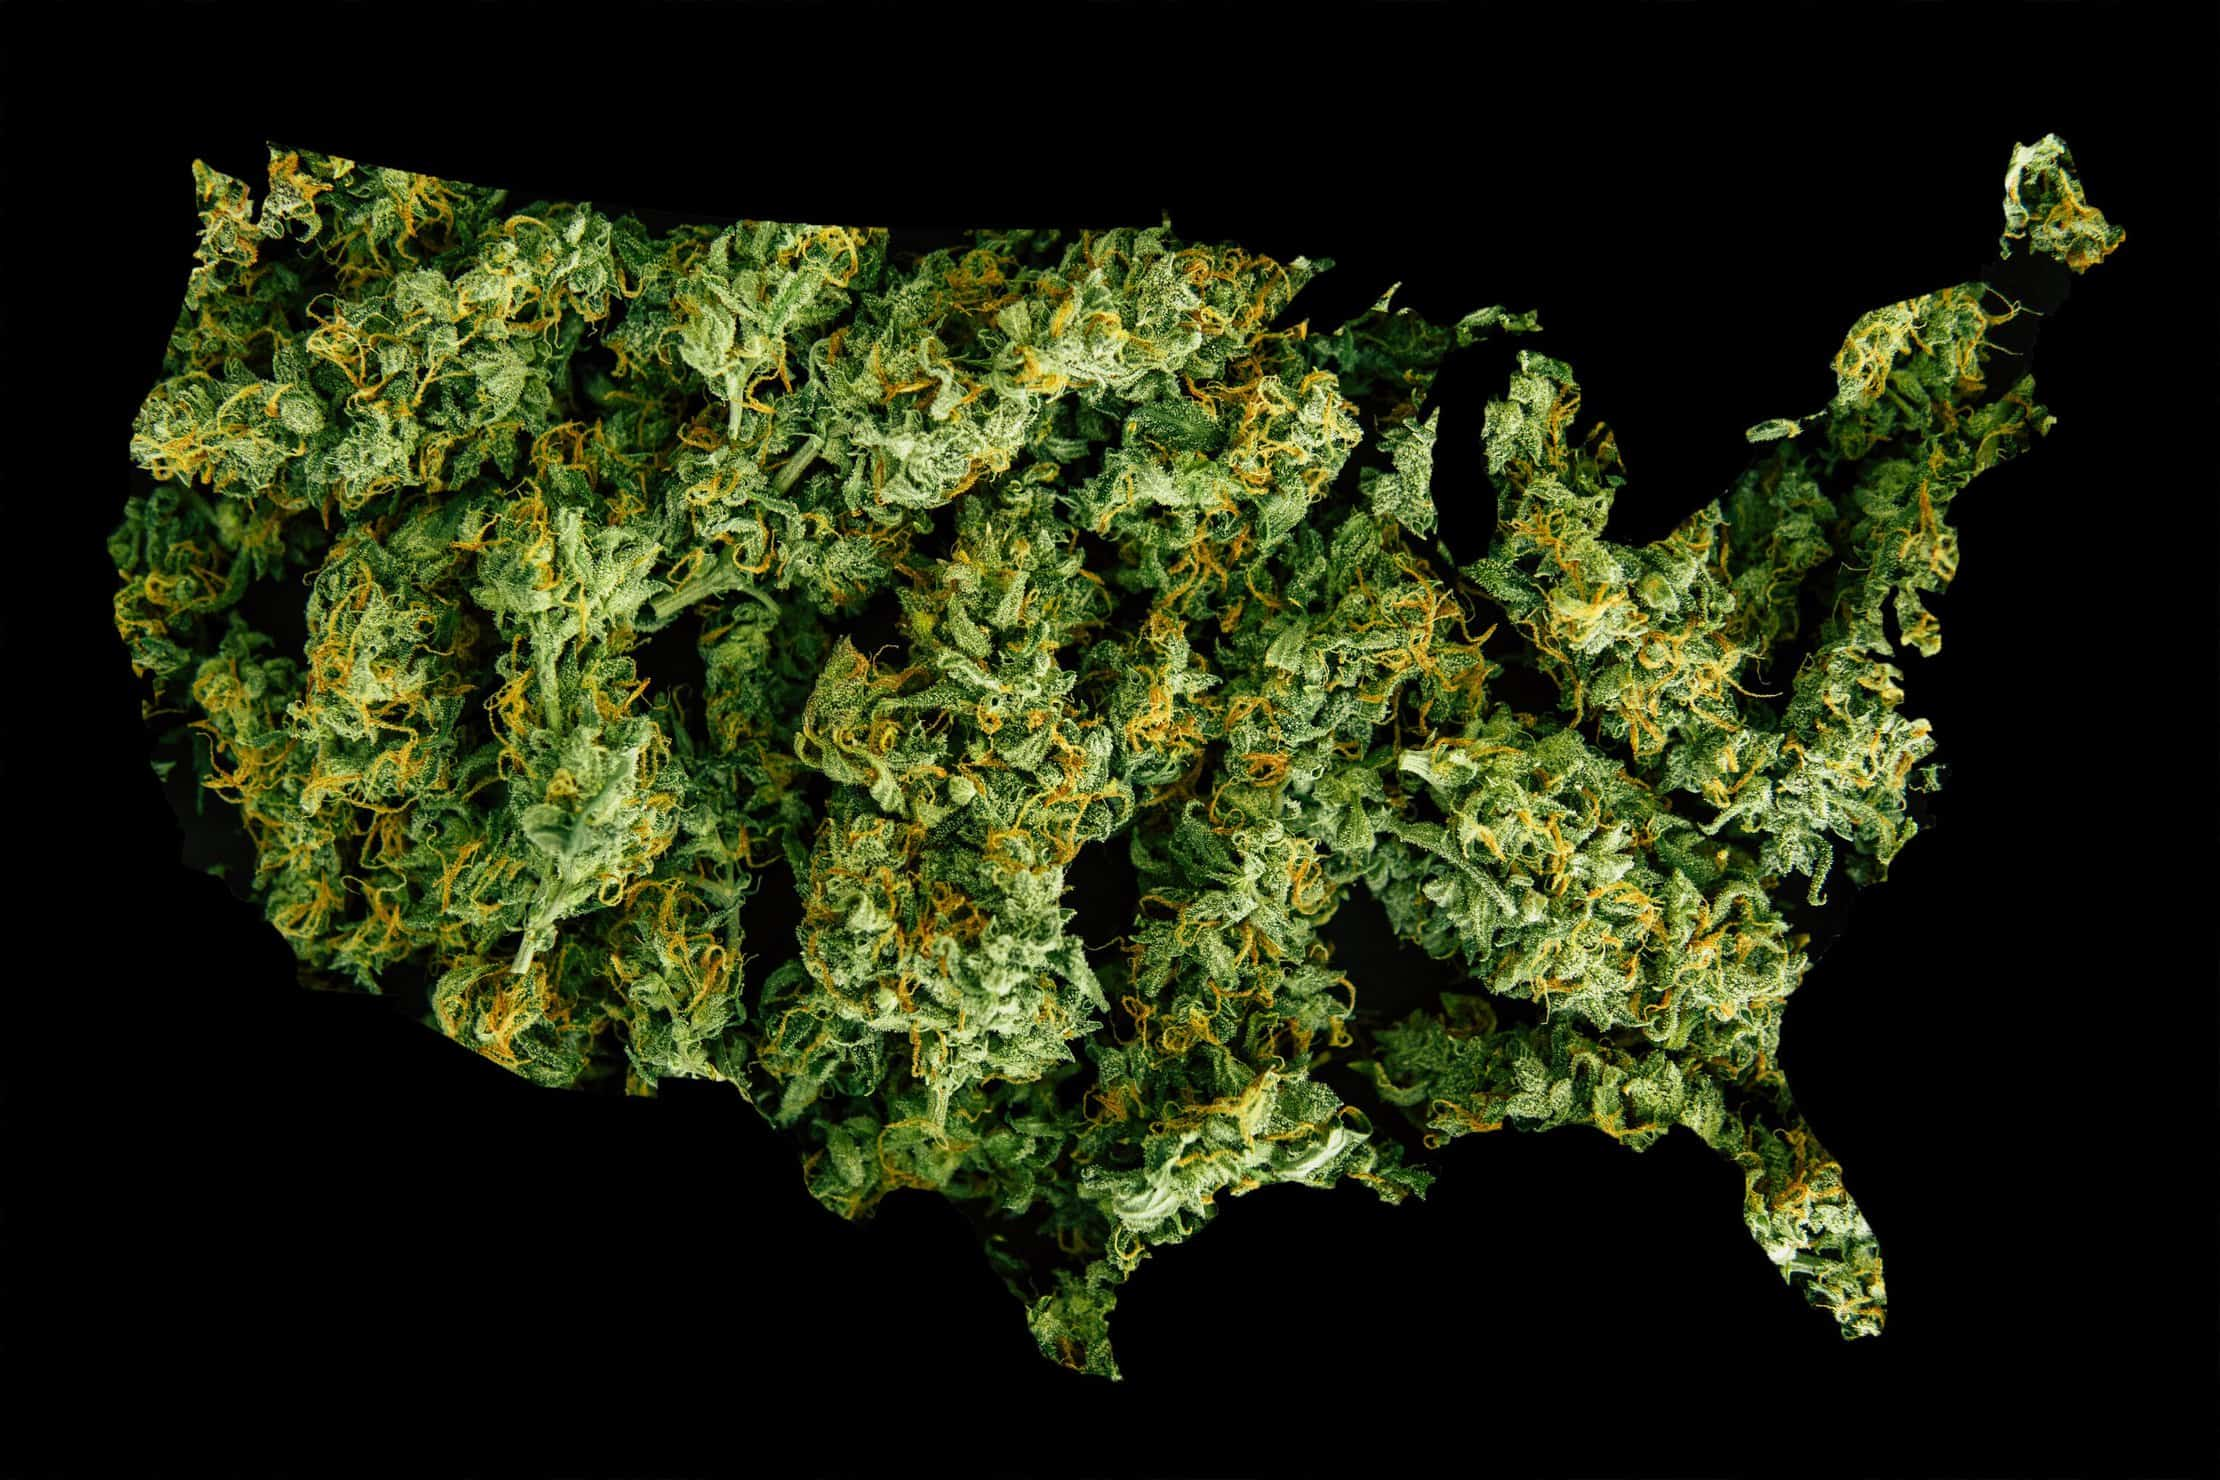 Cannabis Legalization. Legalize marijuana in the United States